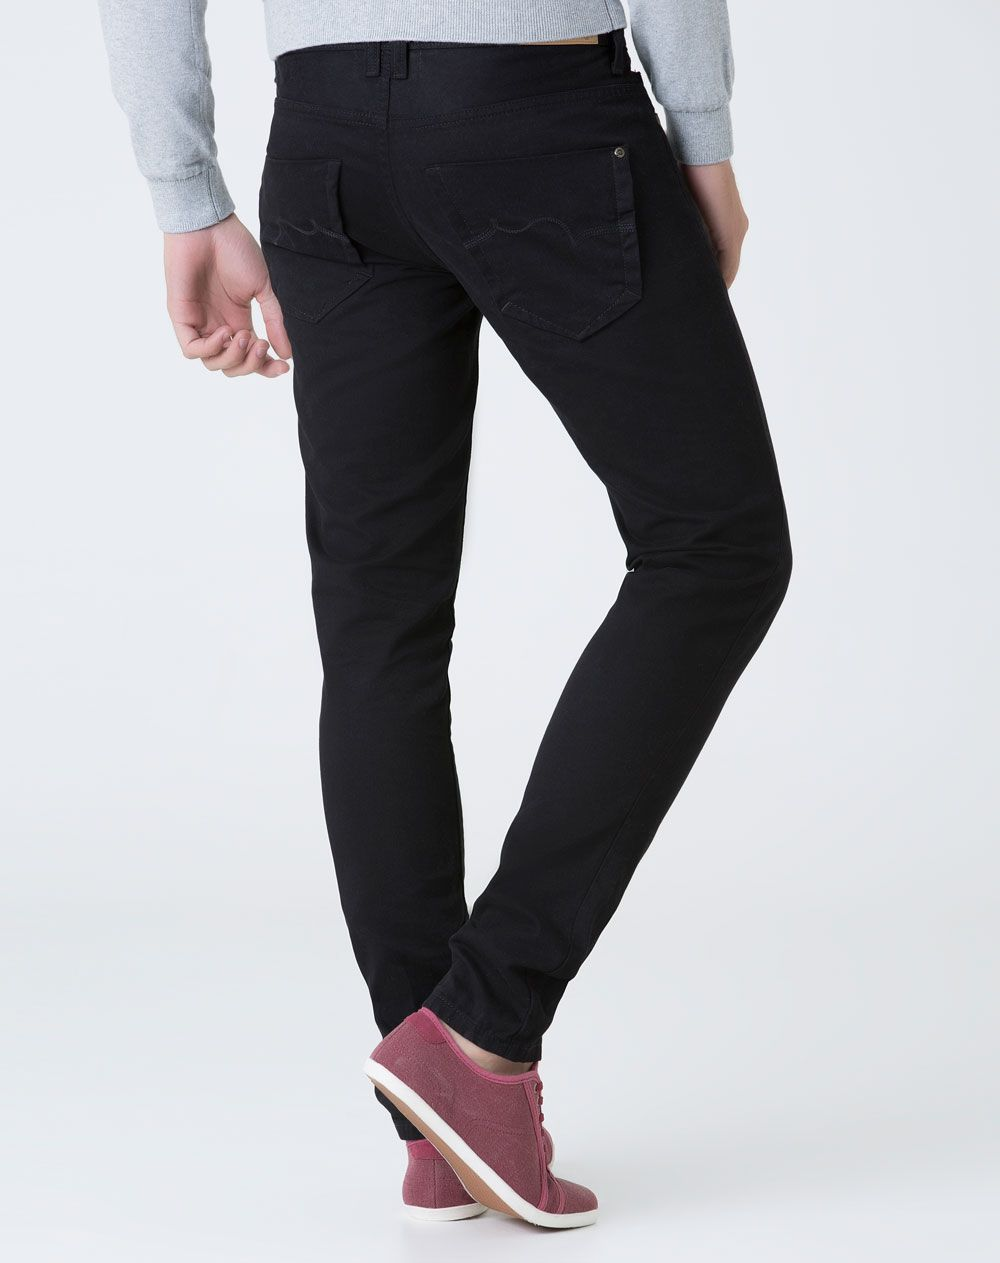 6f9b6b103931c Imagen para Pantalón para Hombre Oklan Color de Gef